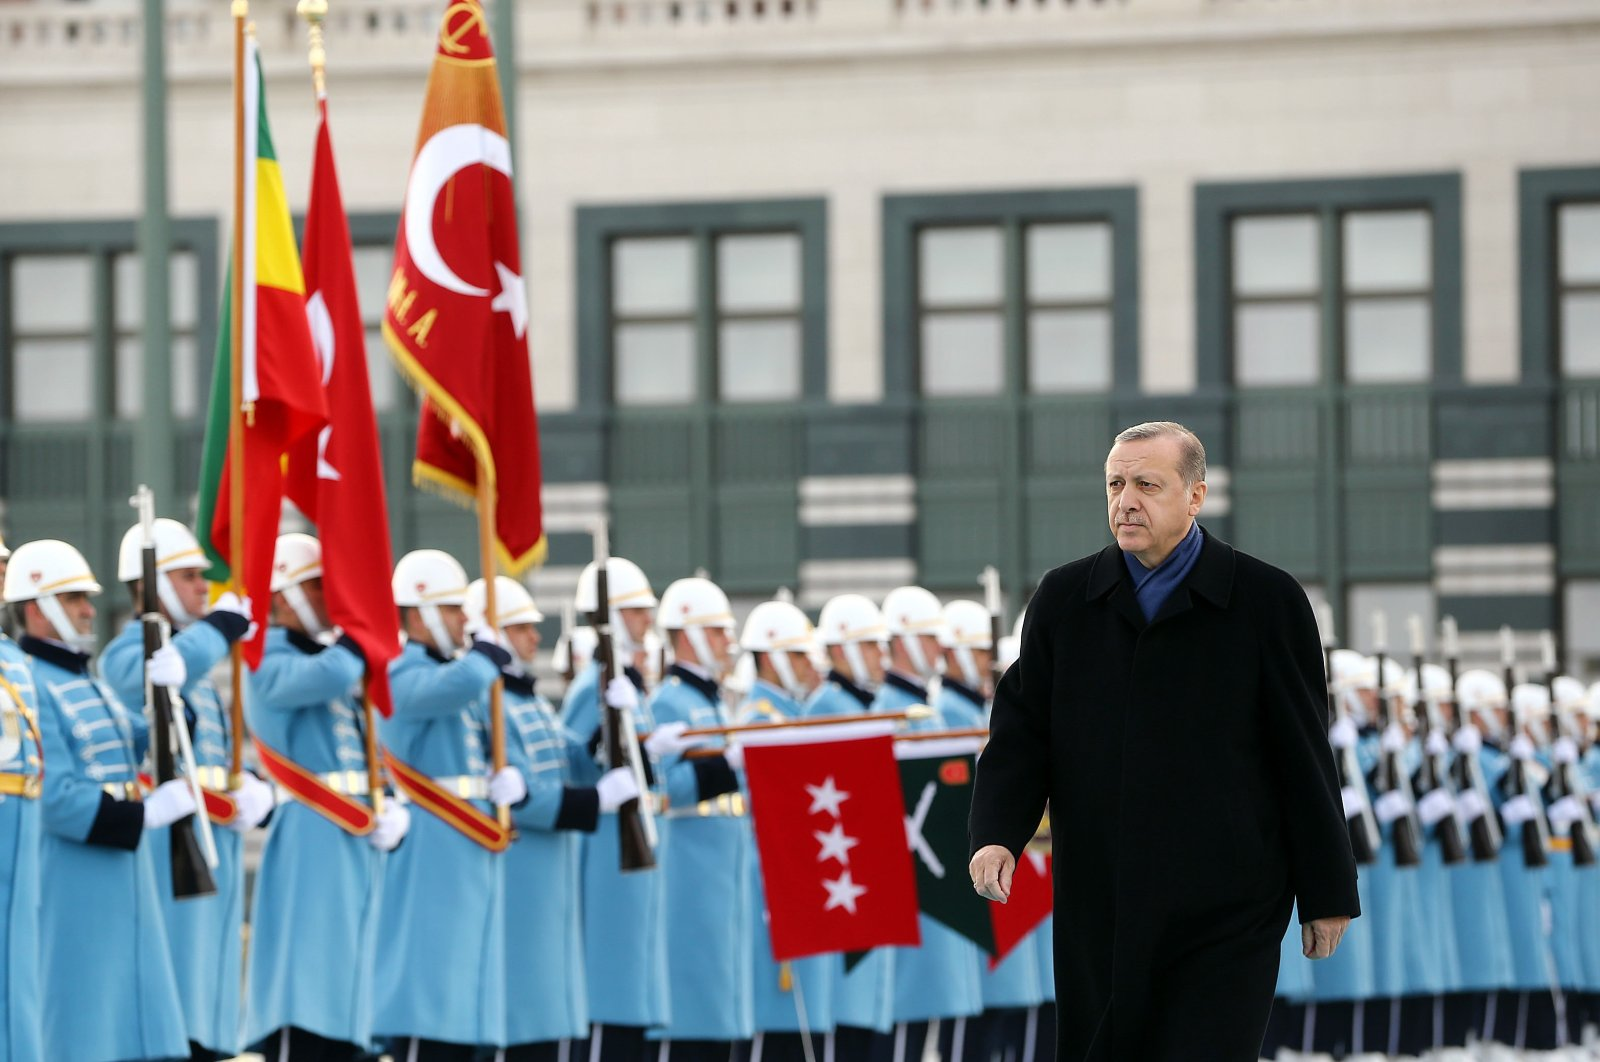 President Recep Tayyip Erdoğan welcomes Ethiopian President Teshome in an official ceremony in Ankara, Turkey, Feb. 7, 2017. (Sabah File Photo)